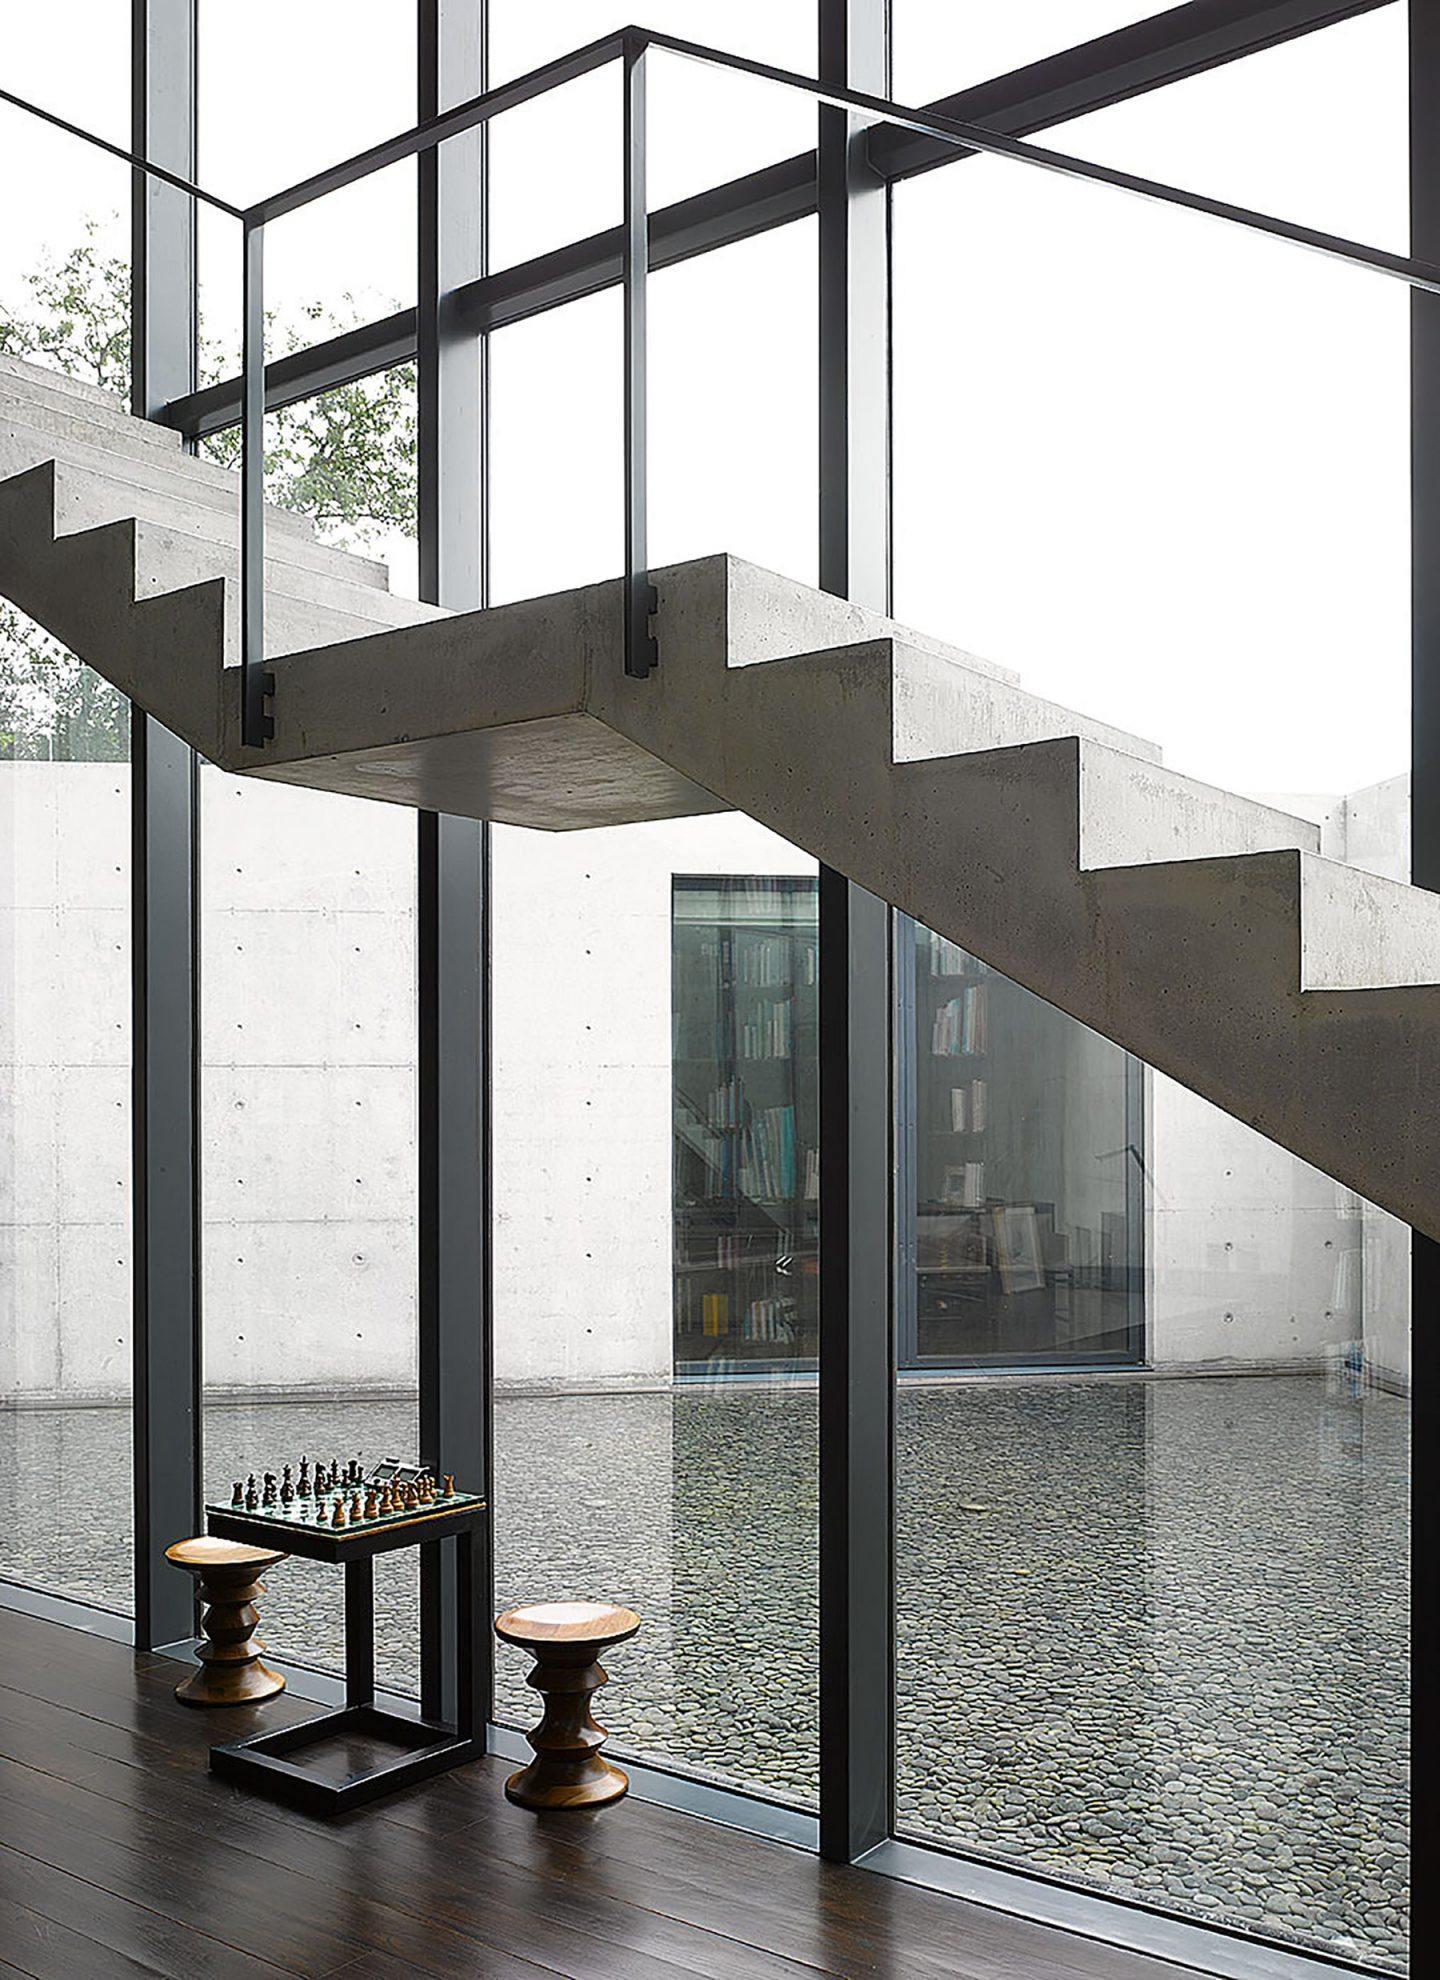 IGNANT-Architecture-Tadao-Ando-Casa-Monterry-6